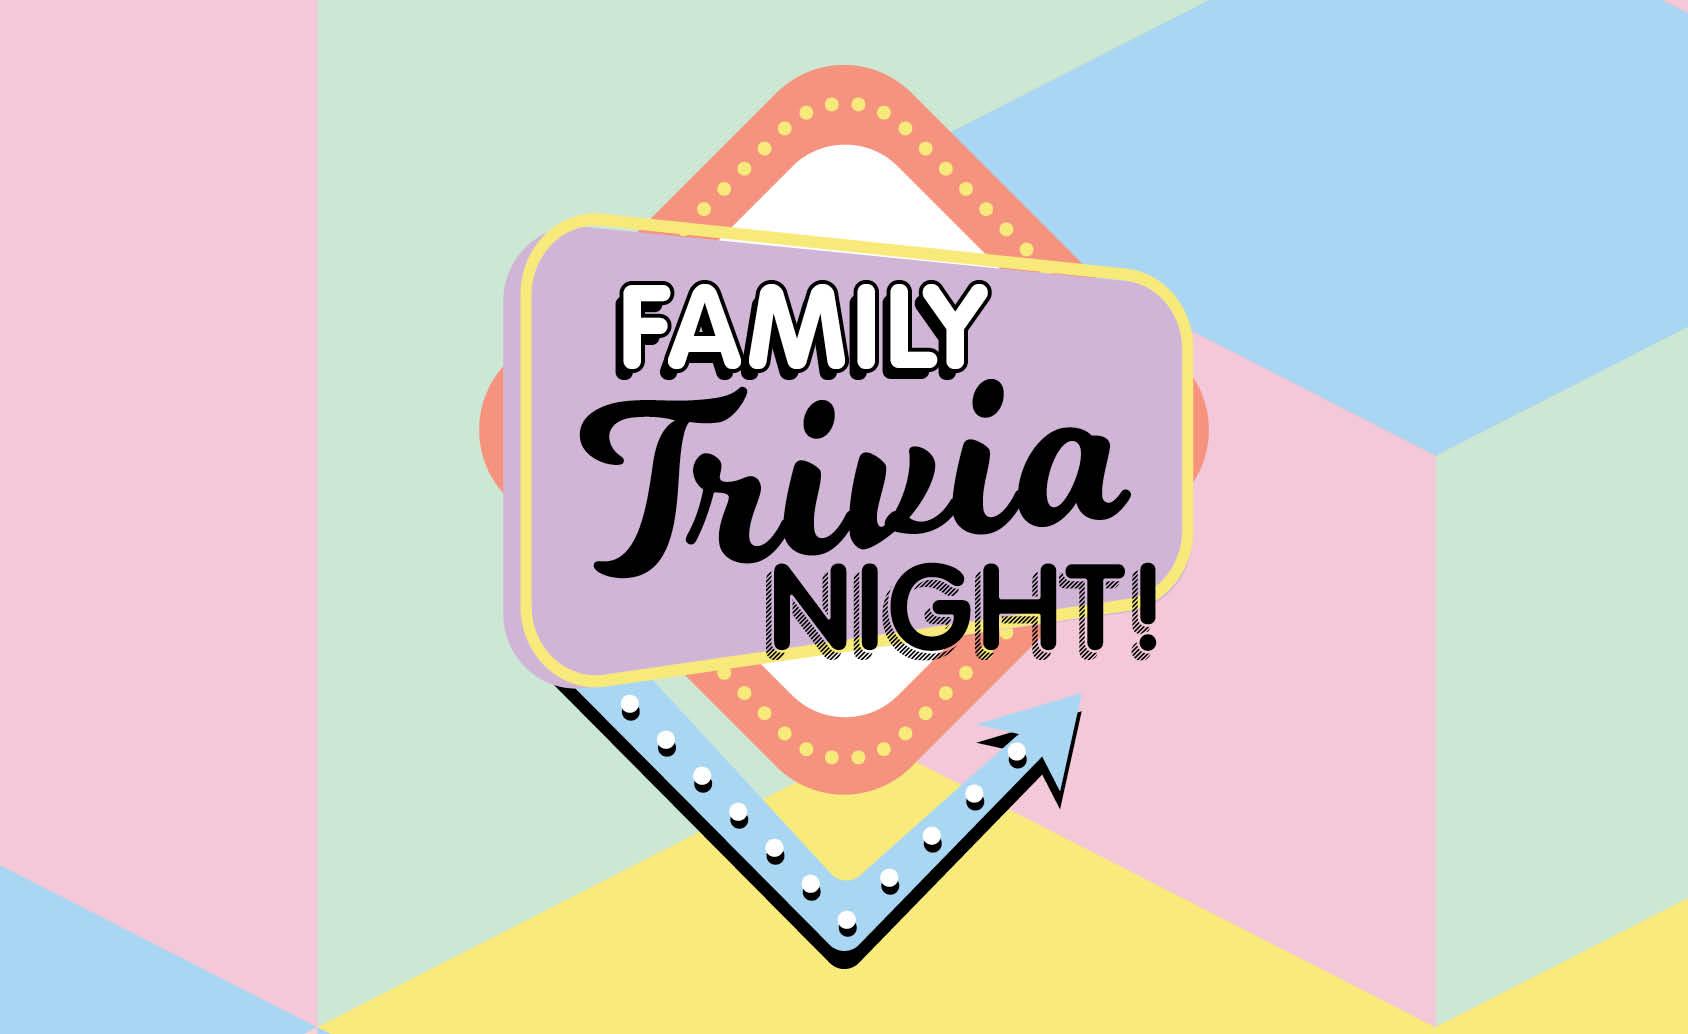 CH5661_Charter Hall_Family Trivia Night_Web Tiles_844x517